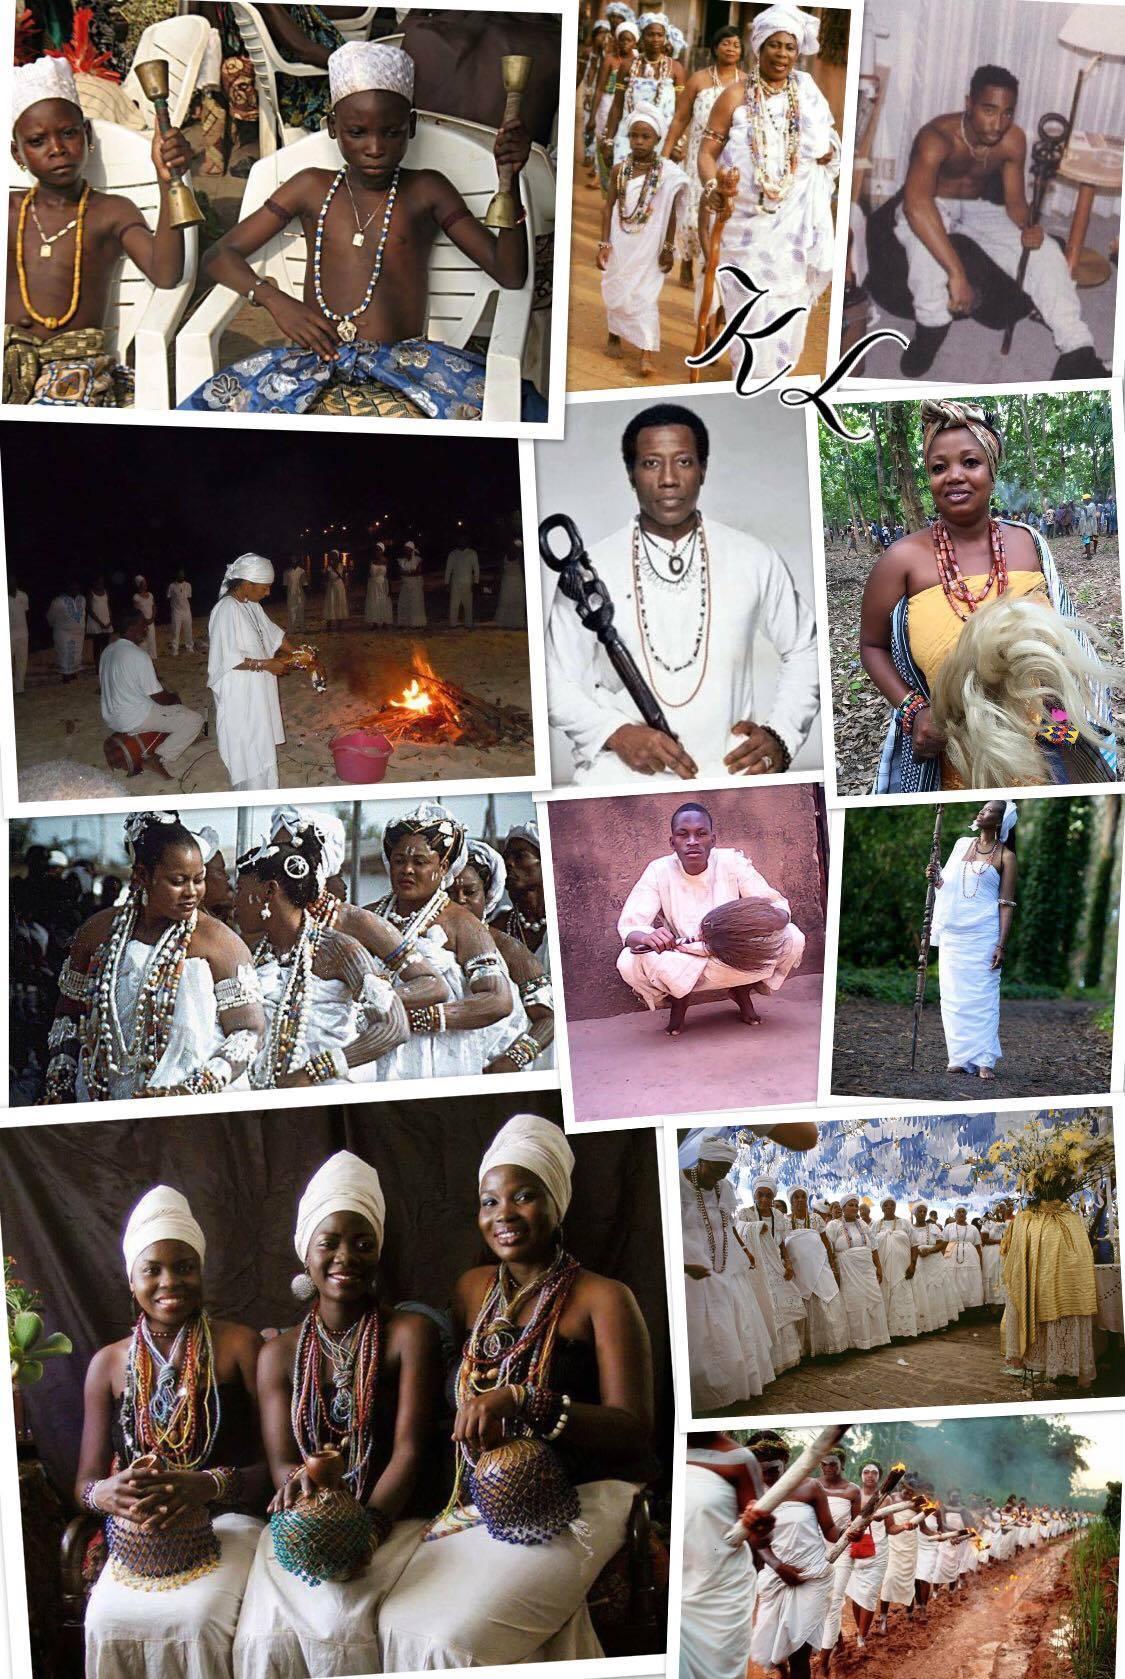 Spiritualité et Tradition africaine!